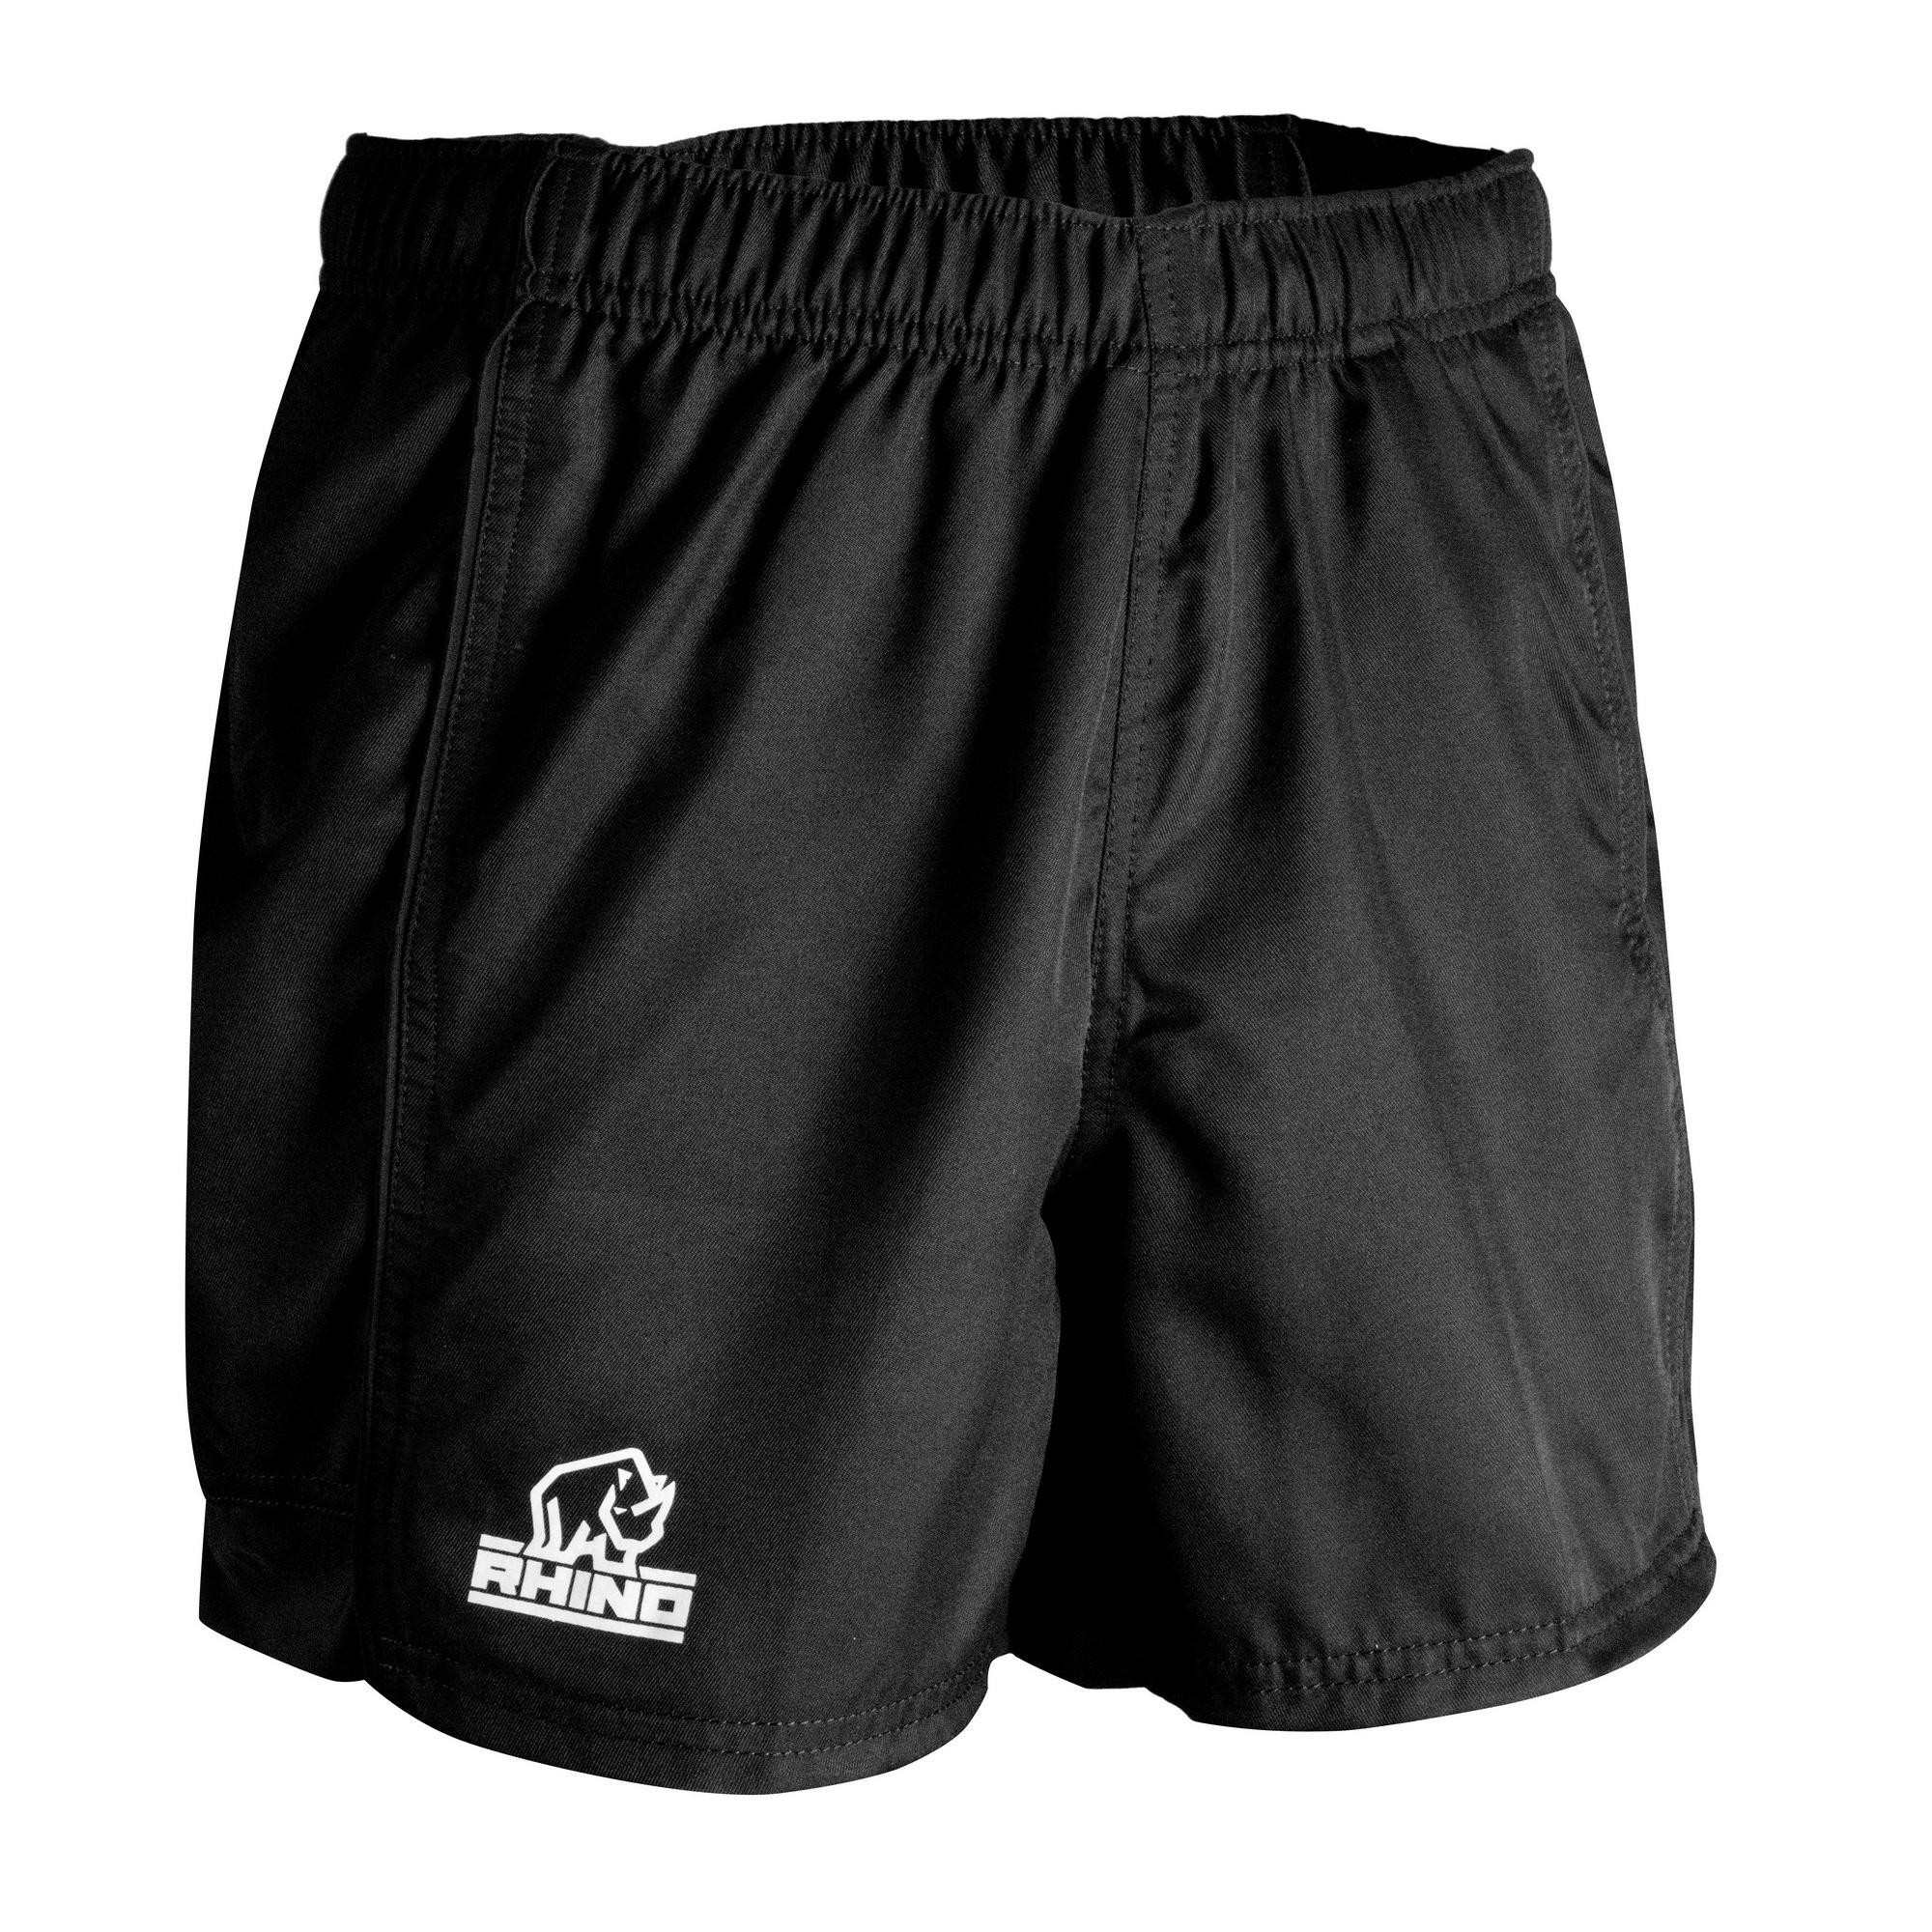 Rhino Childrens/Kids Auckland Rugby Shorts (LB) (Black)